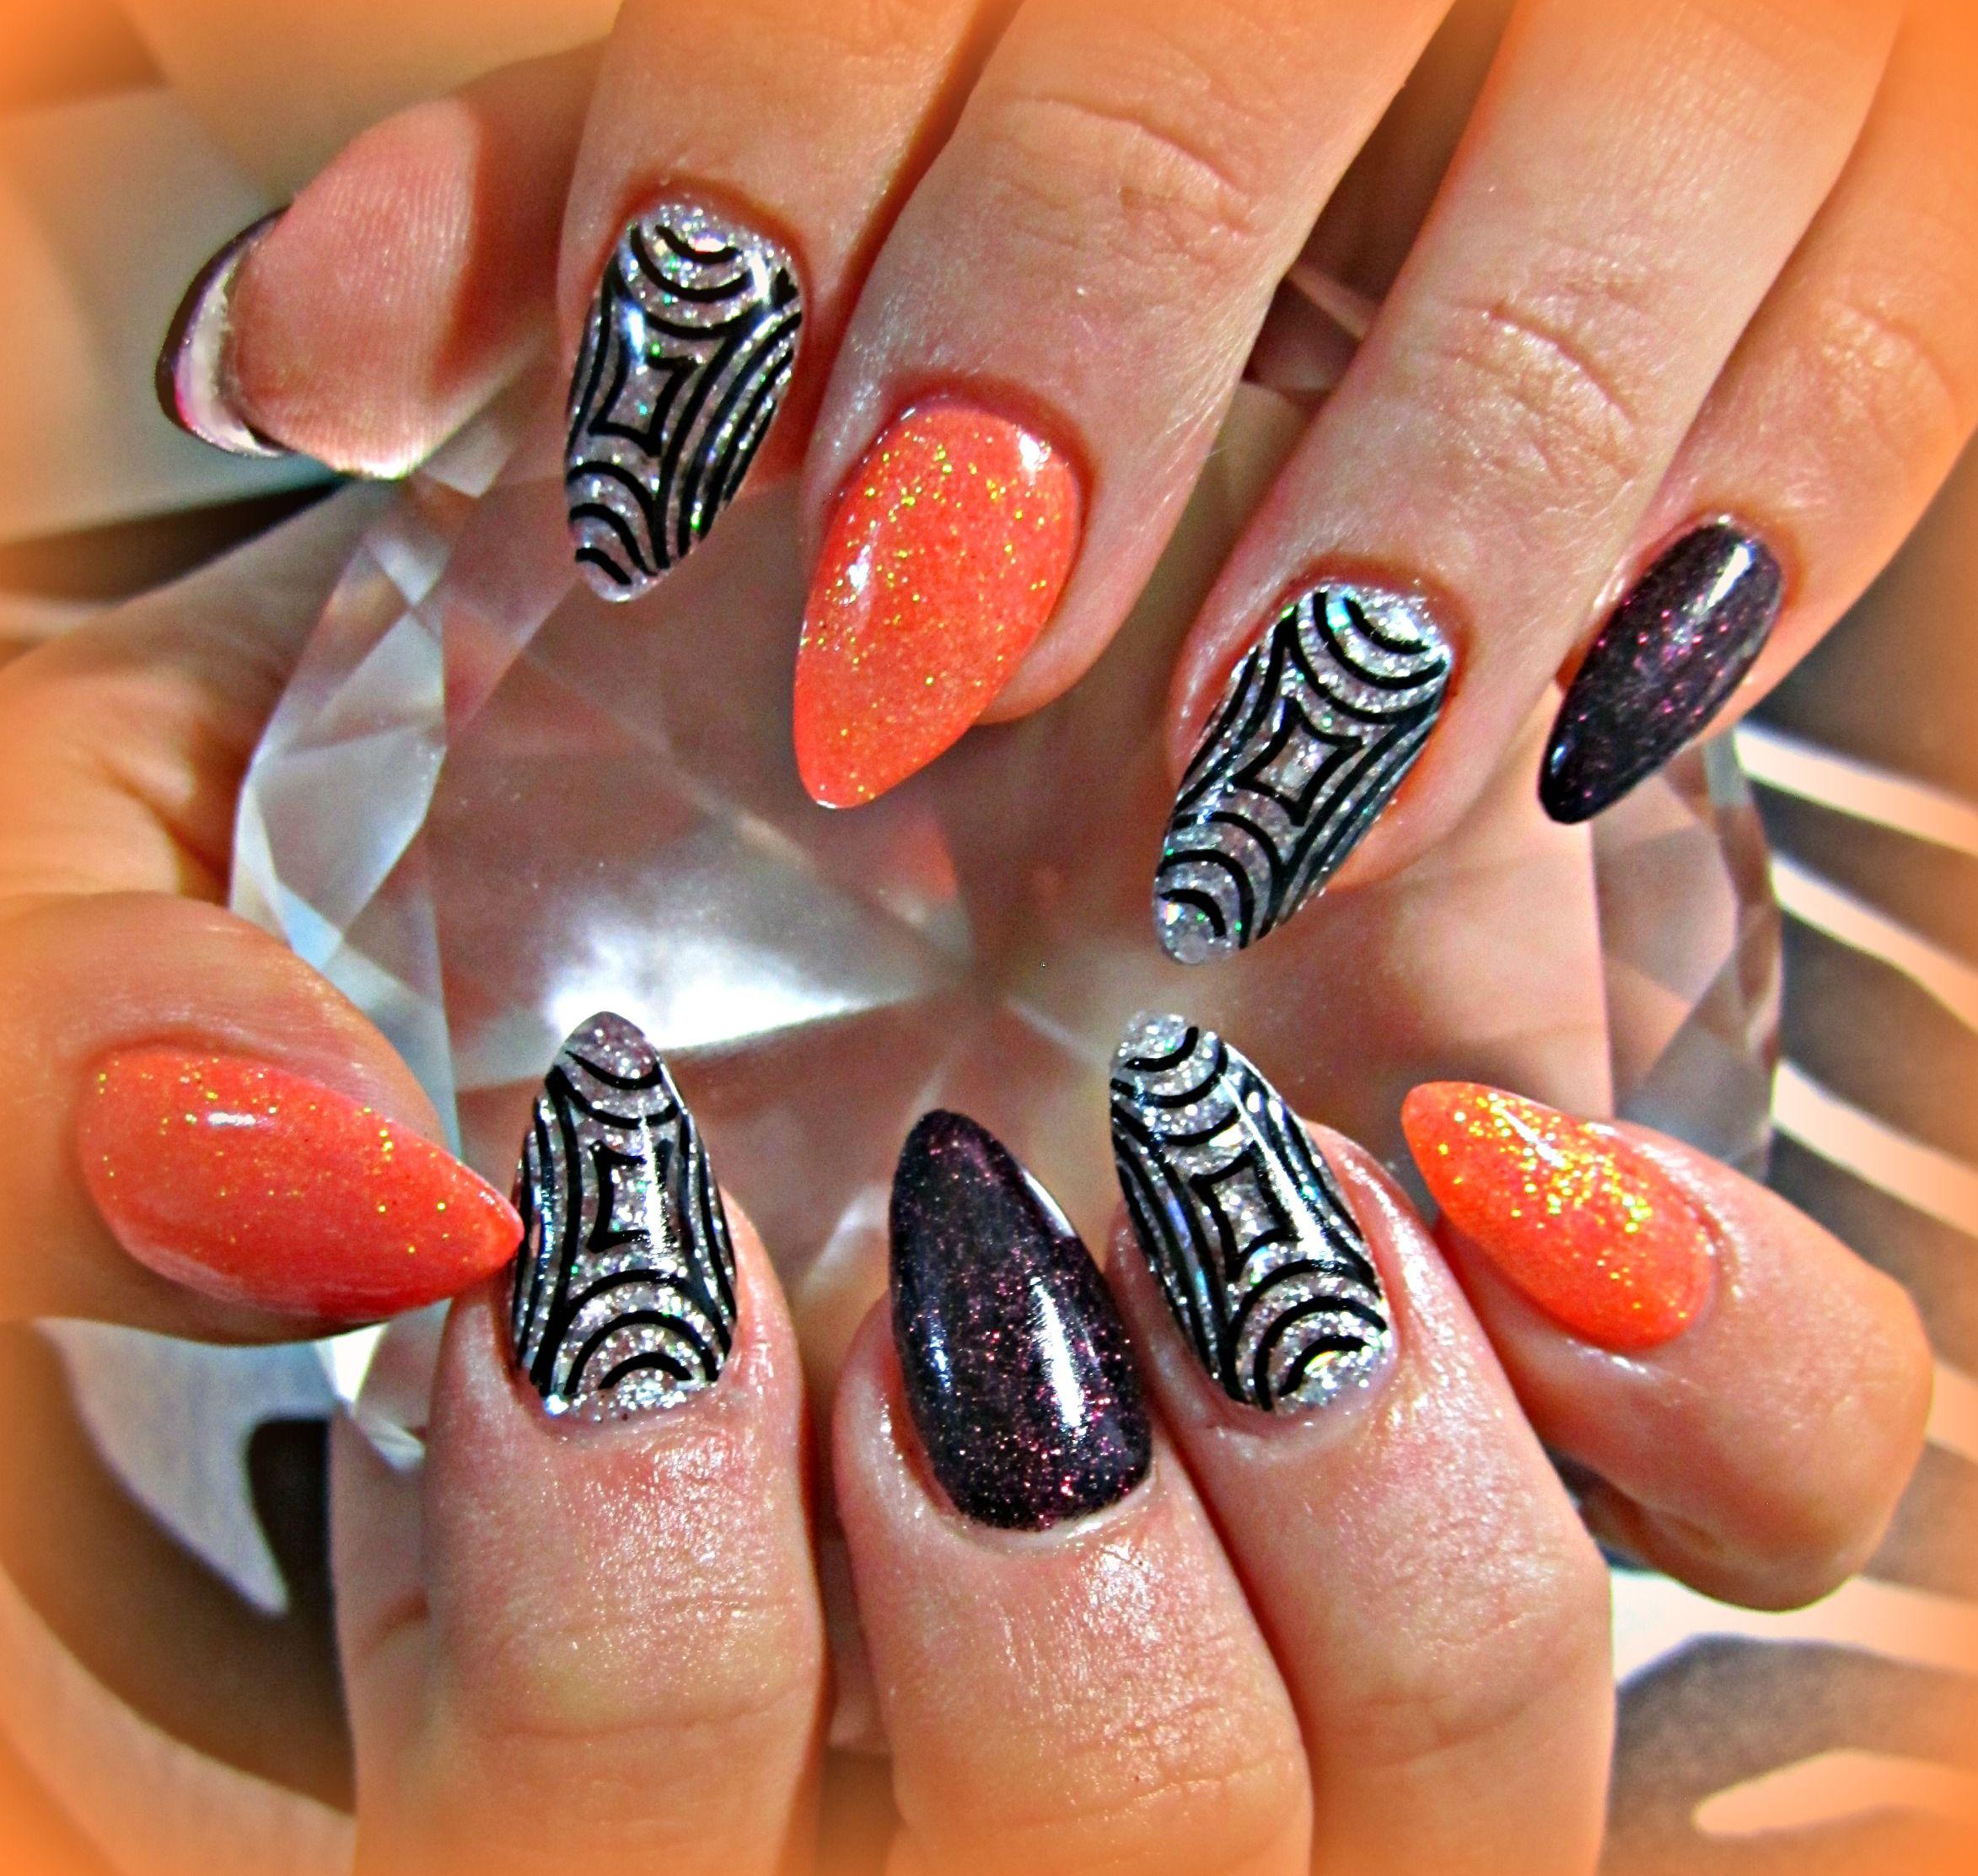 Almond-Shaped Acrylic Nails